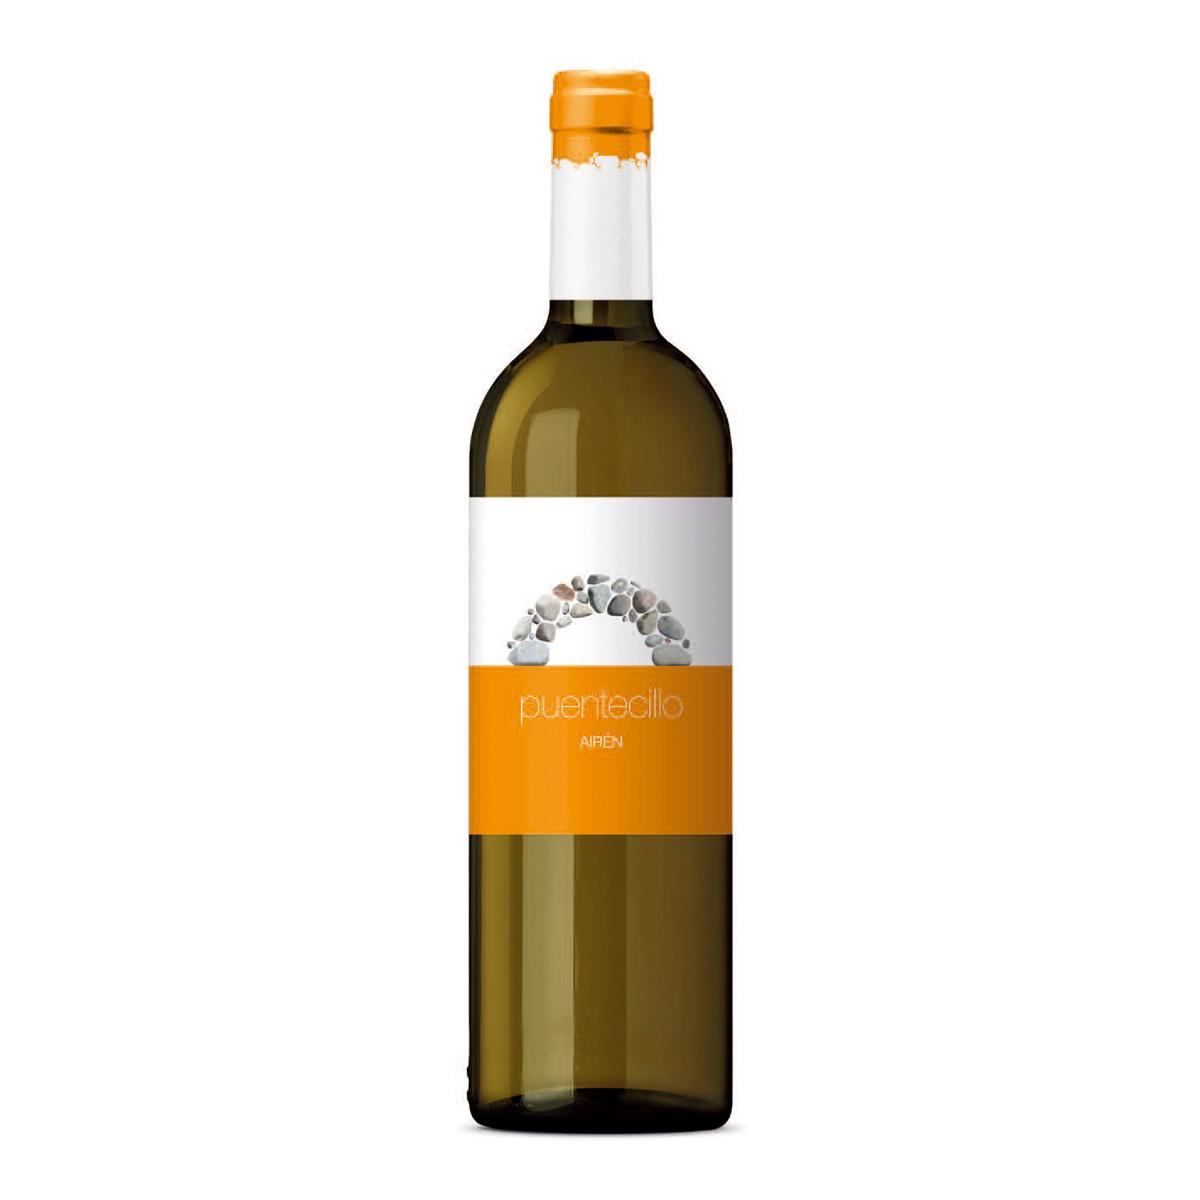 西班牙PUENTECILLO AIREN VARIETAL 爱人干白葡萄酒